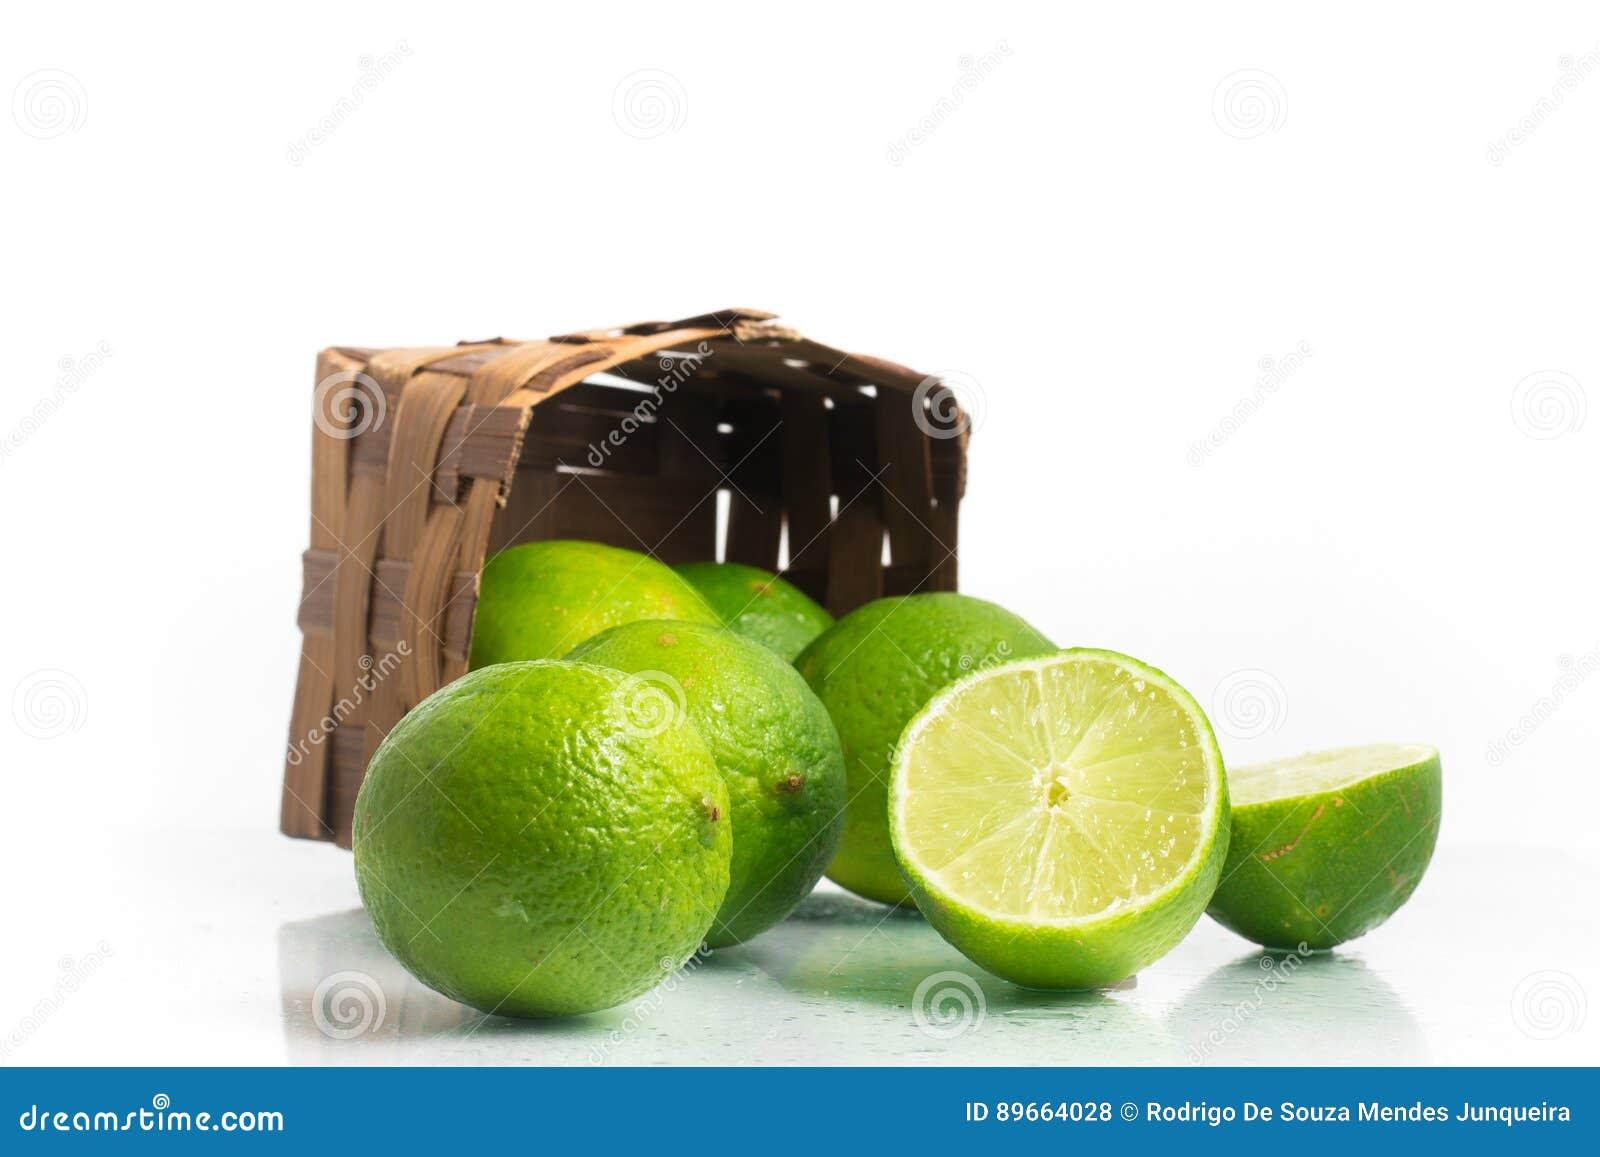 Can fruits basket lemon threesome